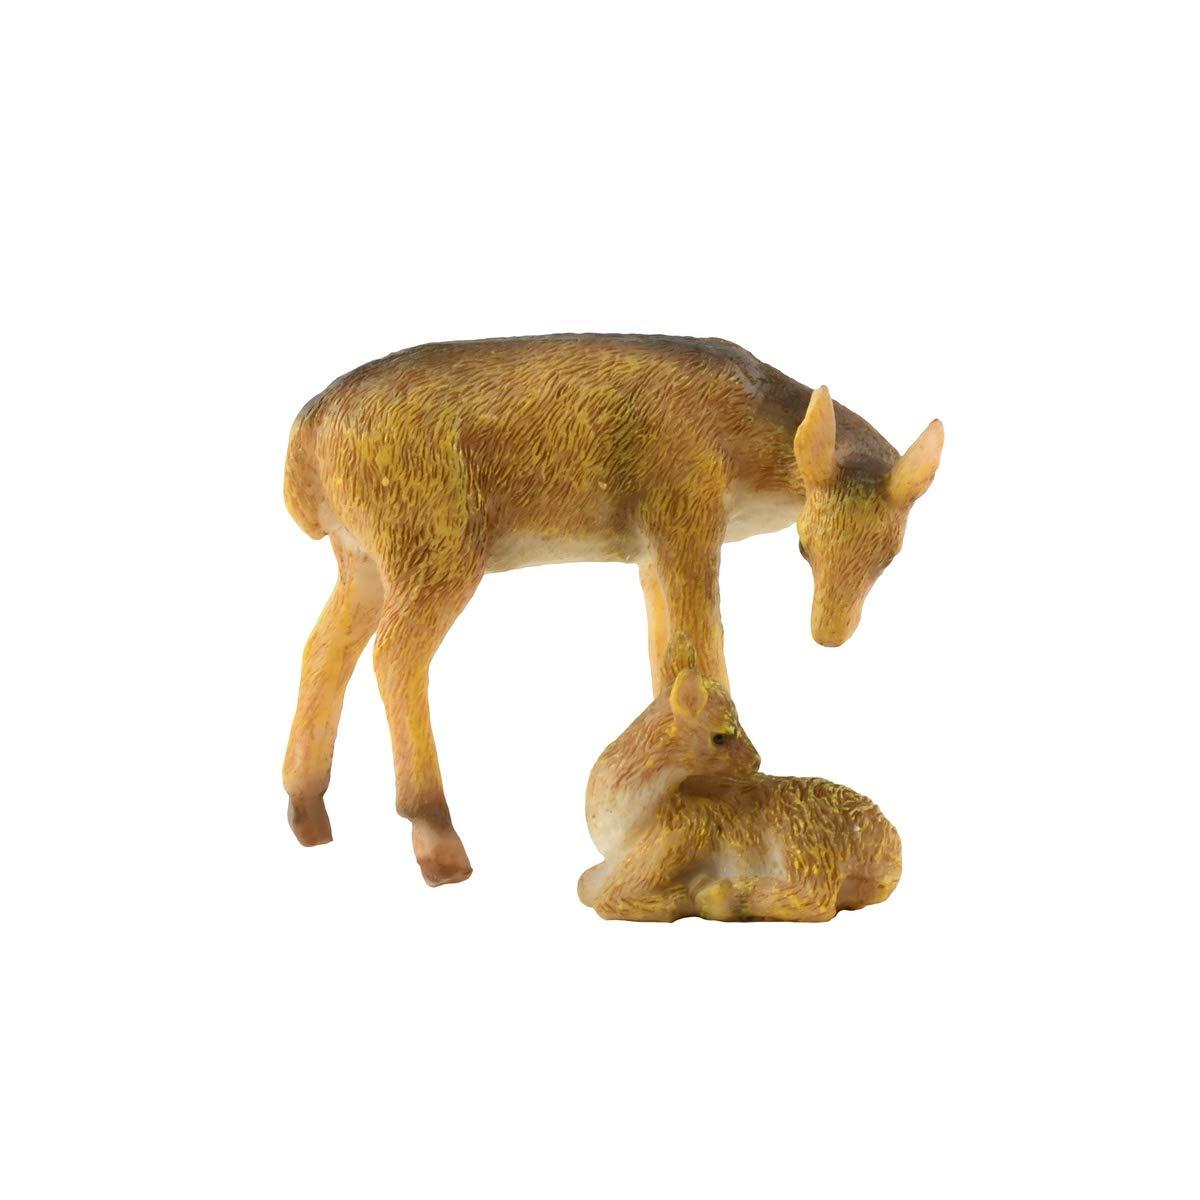 TG,LLC Miniature Deer Fawn Figurine Outdoor Fairy Garden Decor Dollhouse Landscape Supply